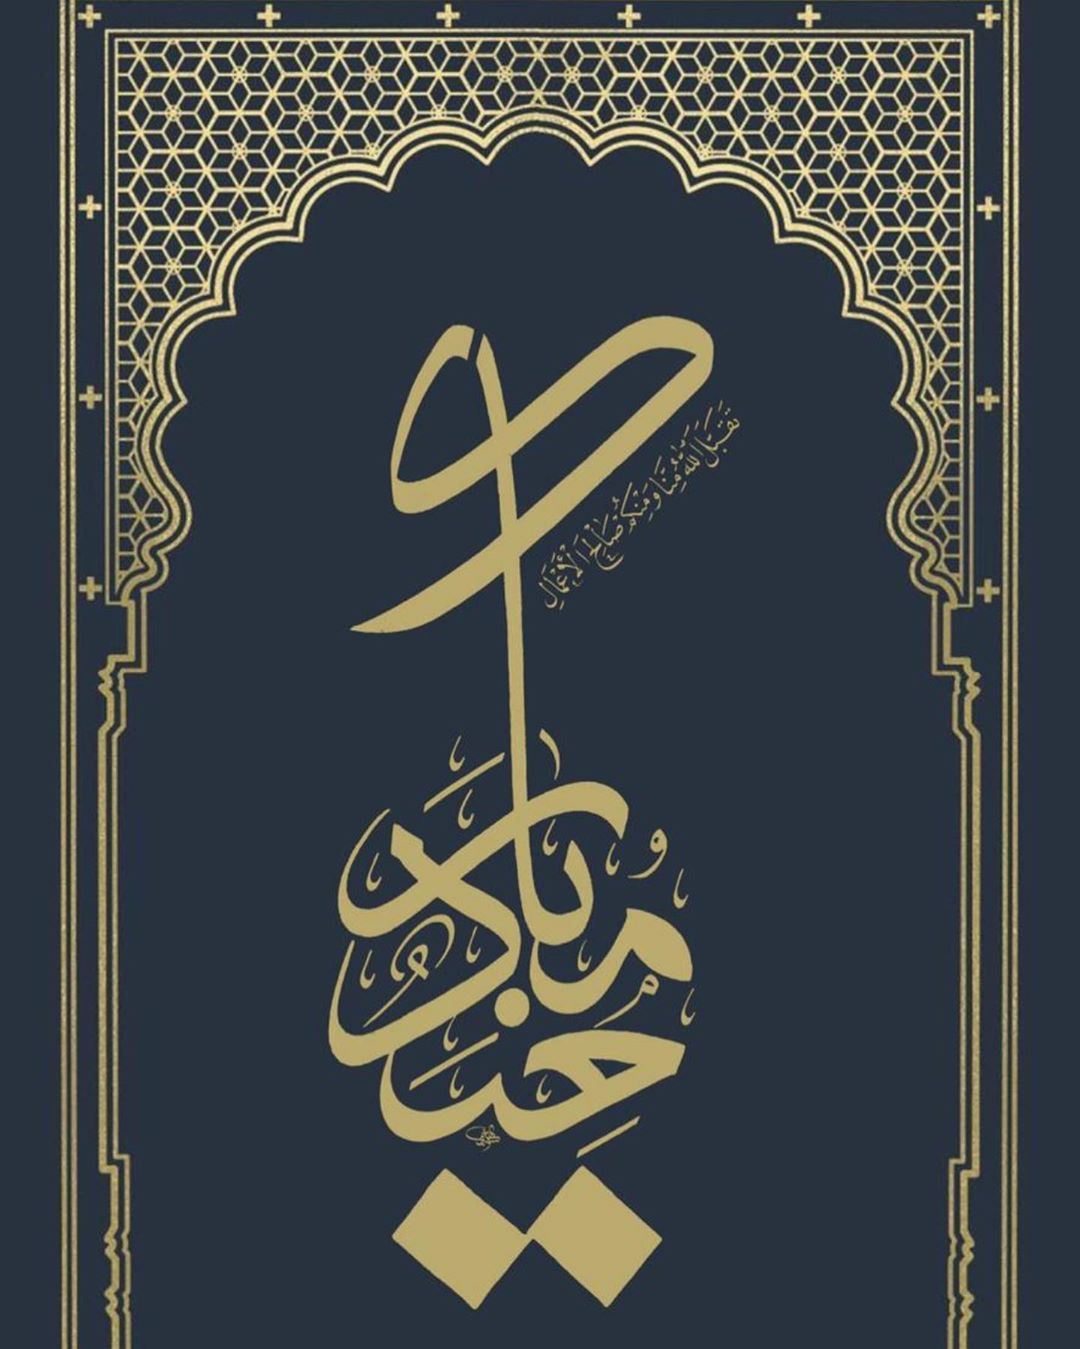 Khat Diwani Ajhalawani/Amr عيدكم مبارك... 1002 1